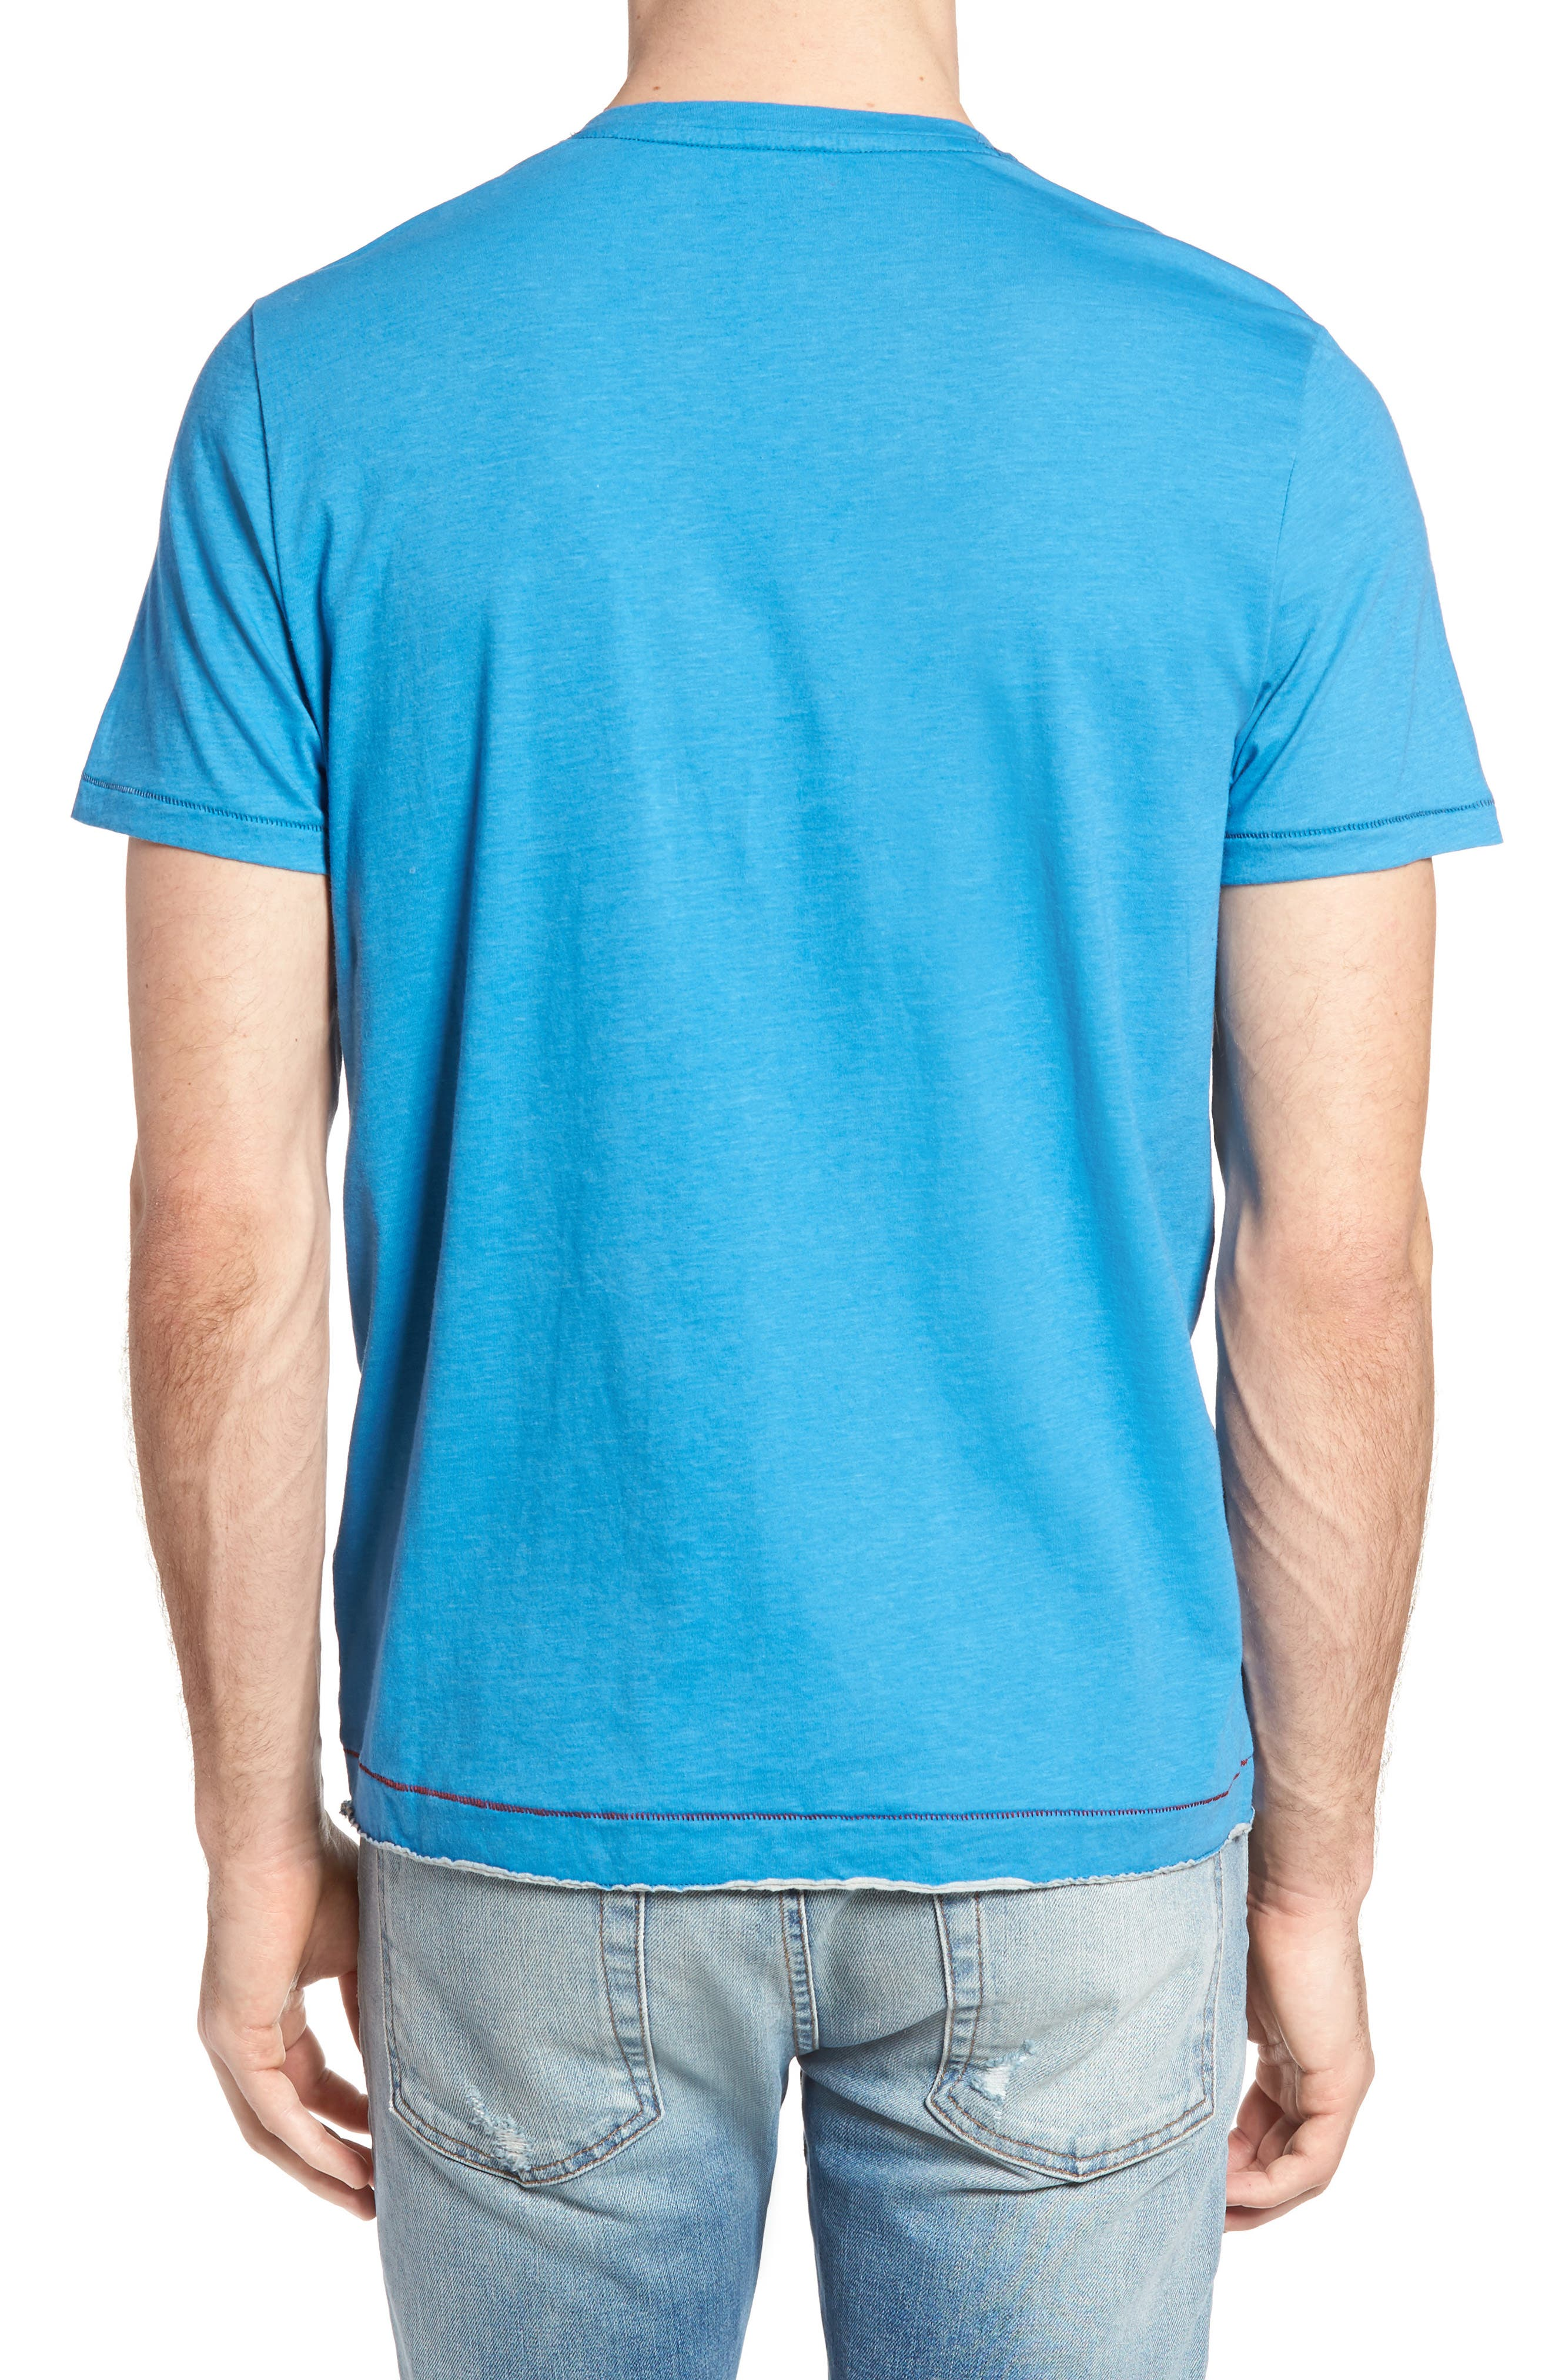 Gus Pad Pocket V-Neck T-Shirt,                             Alternate thumbnail 2, color,                             Mykonos Blue